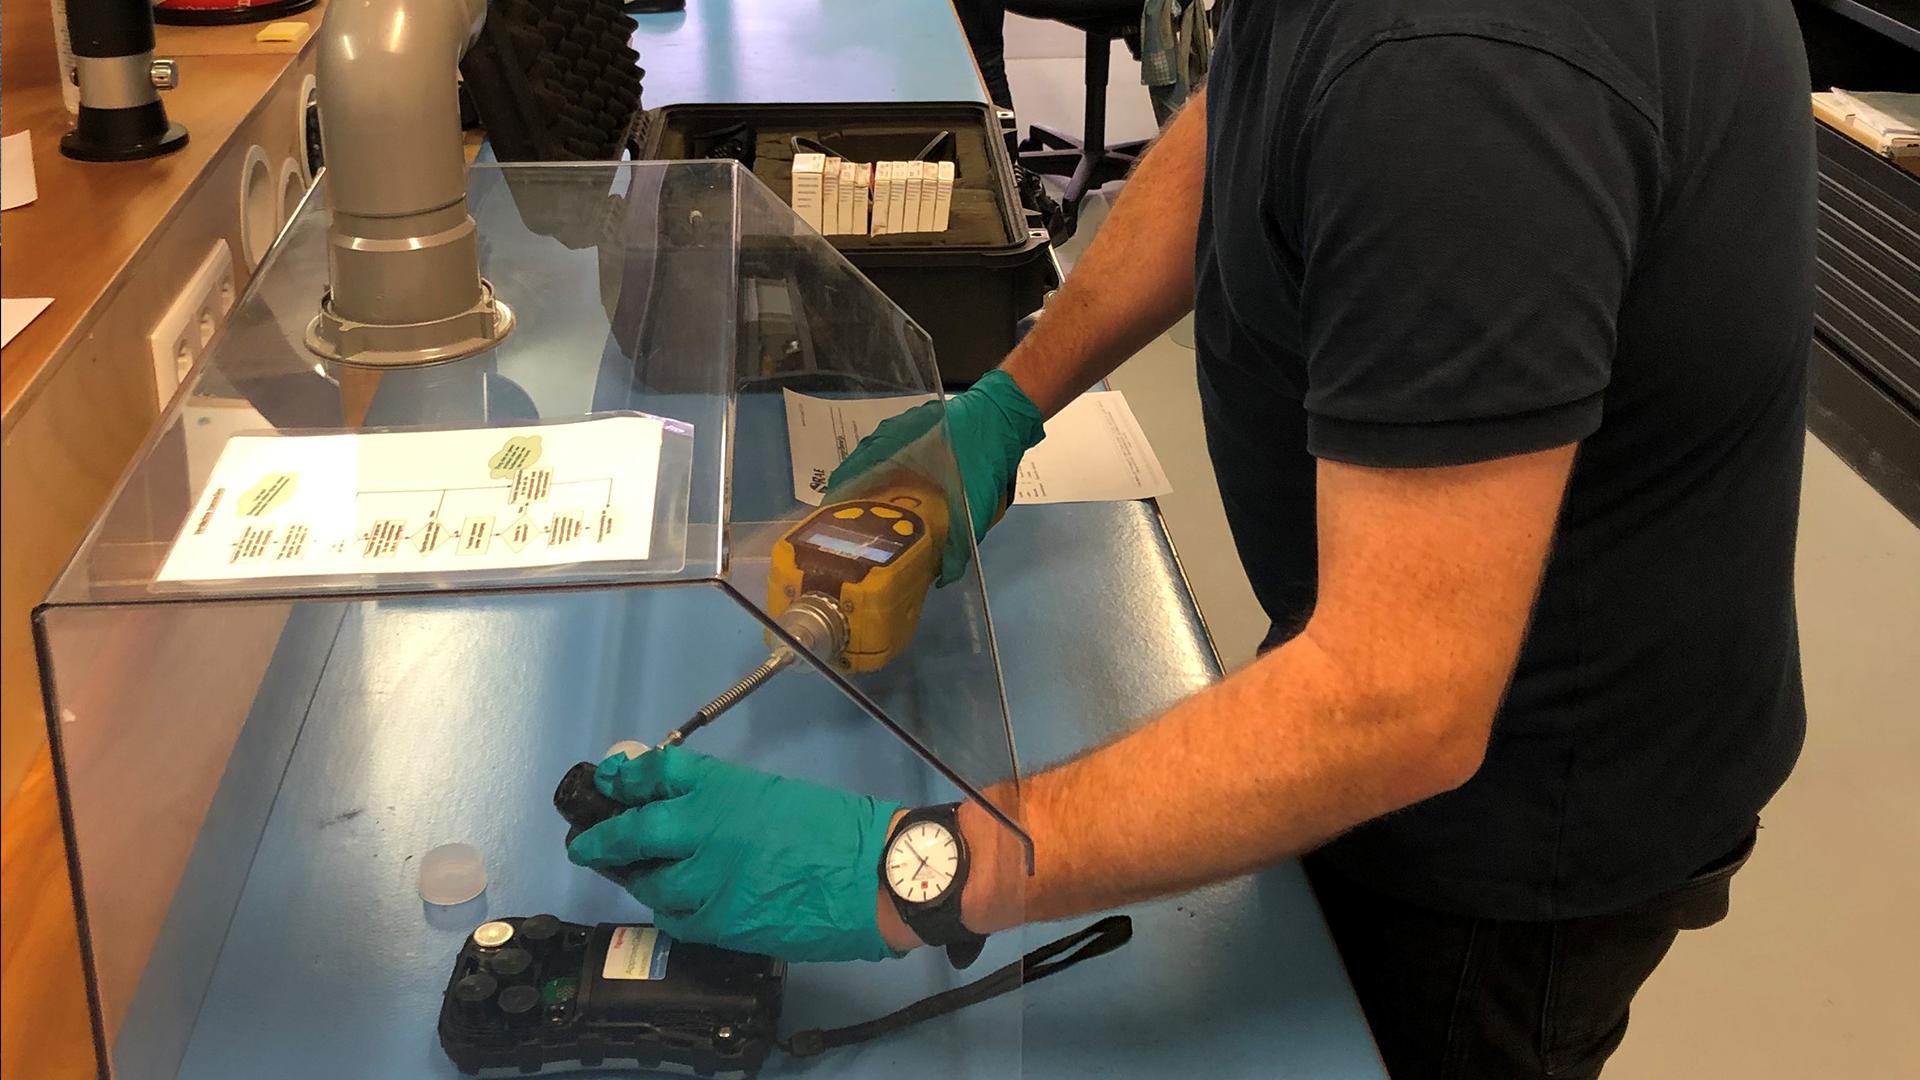 Contaminated instruments need service too